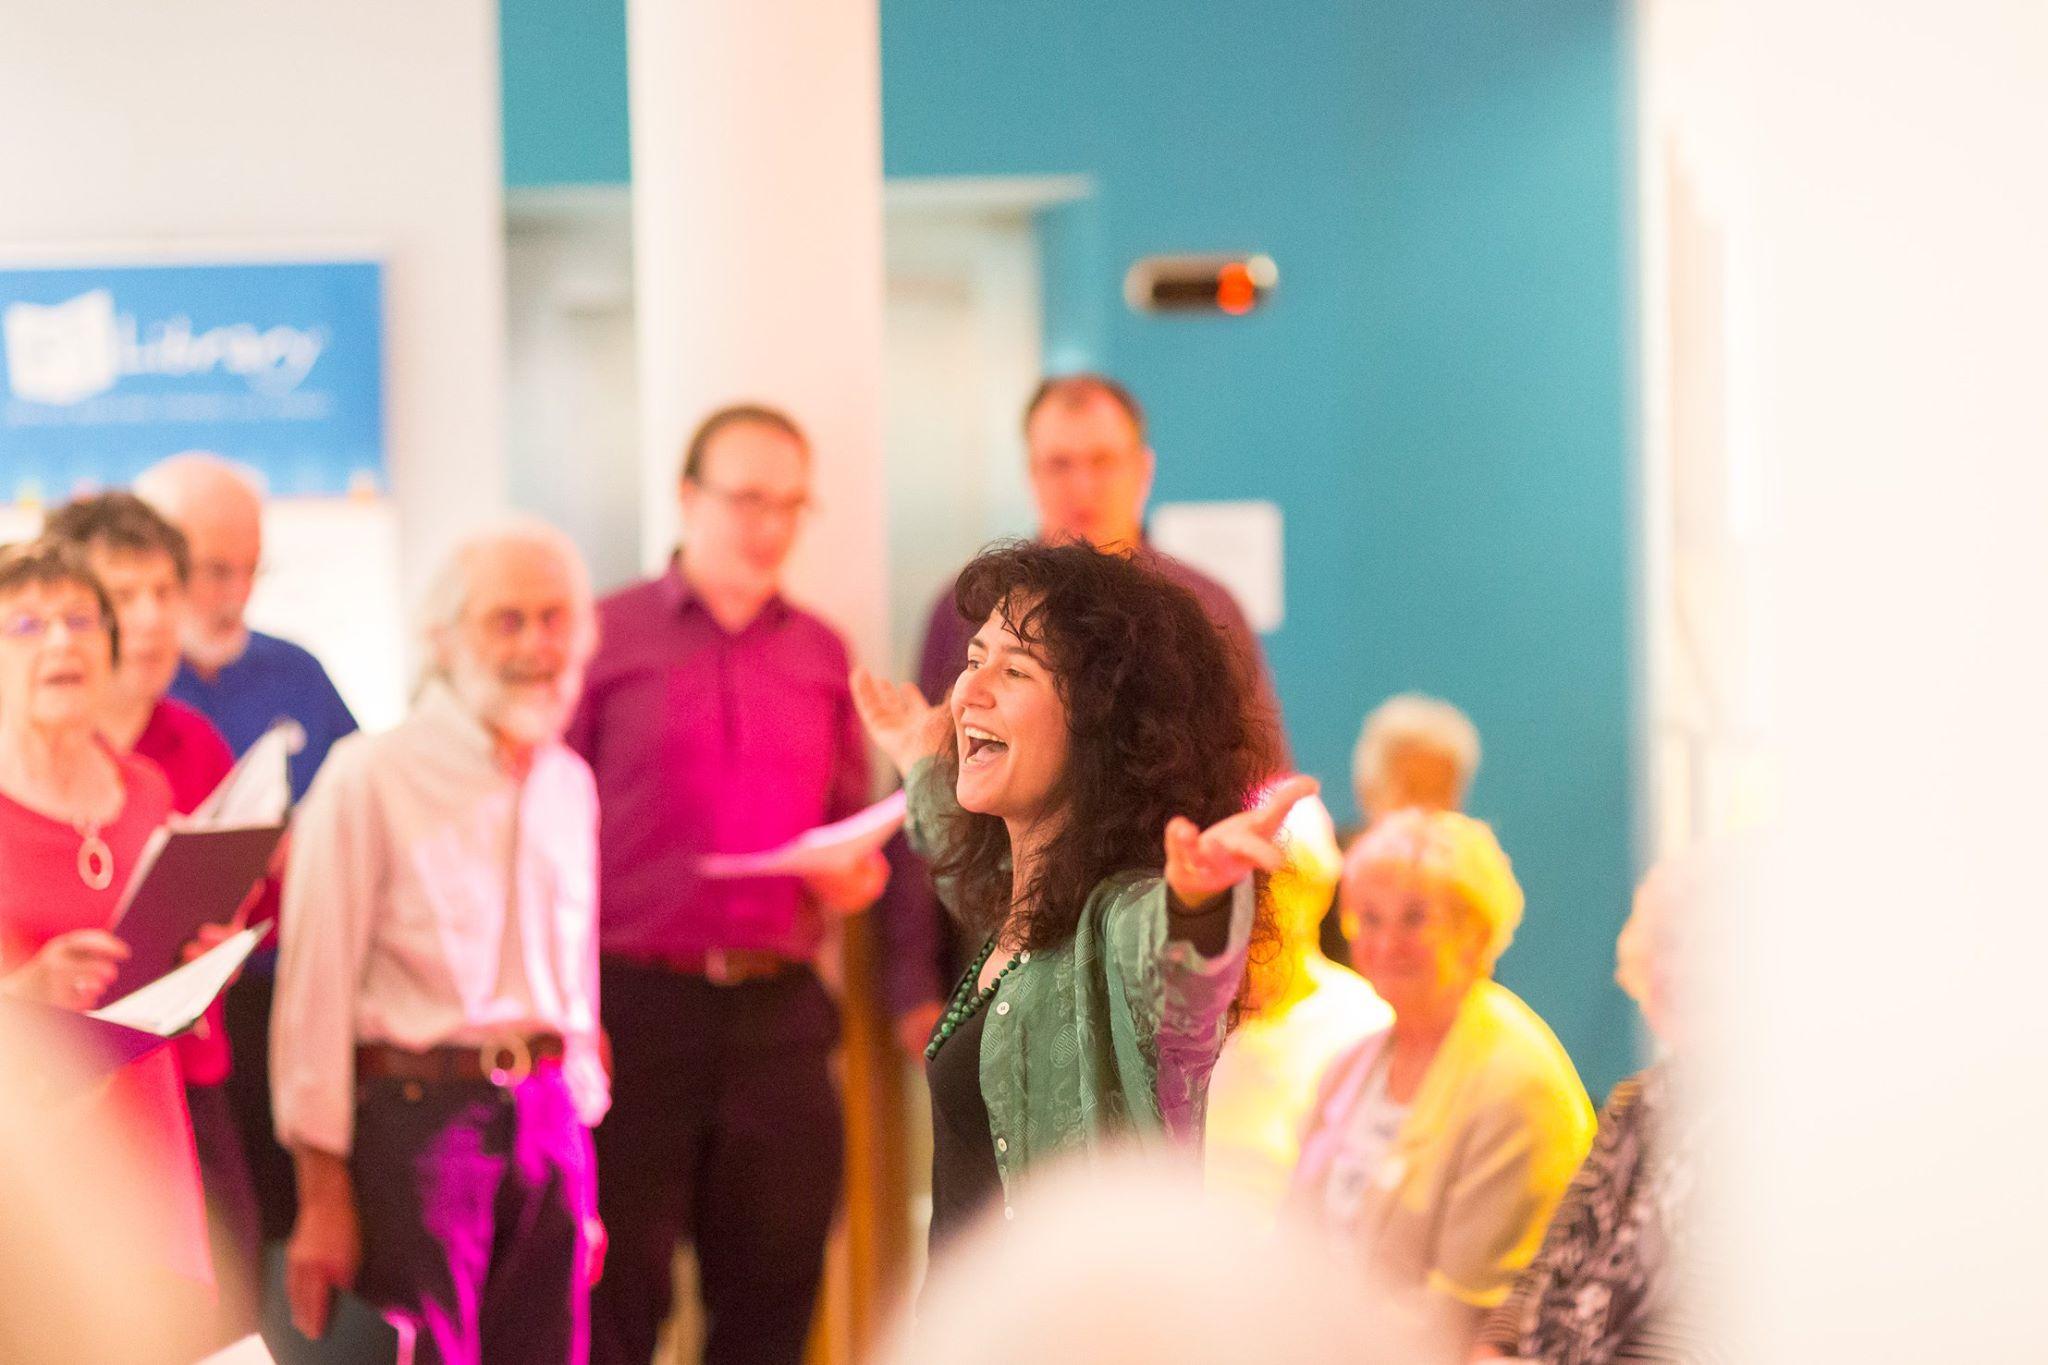 2016 Yiddish choirs